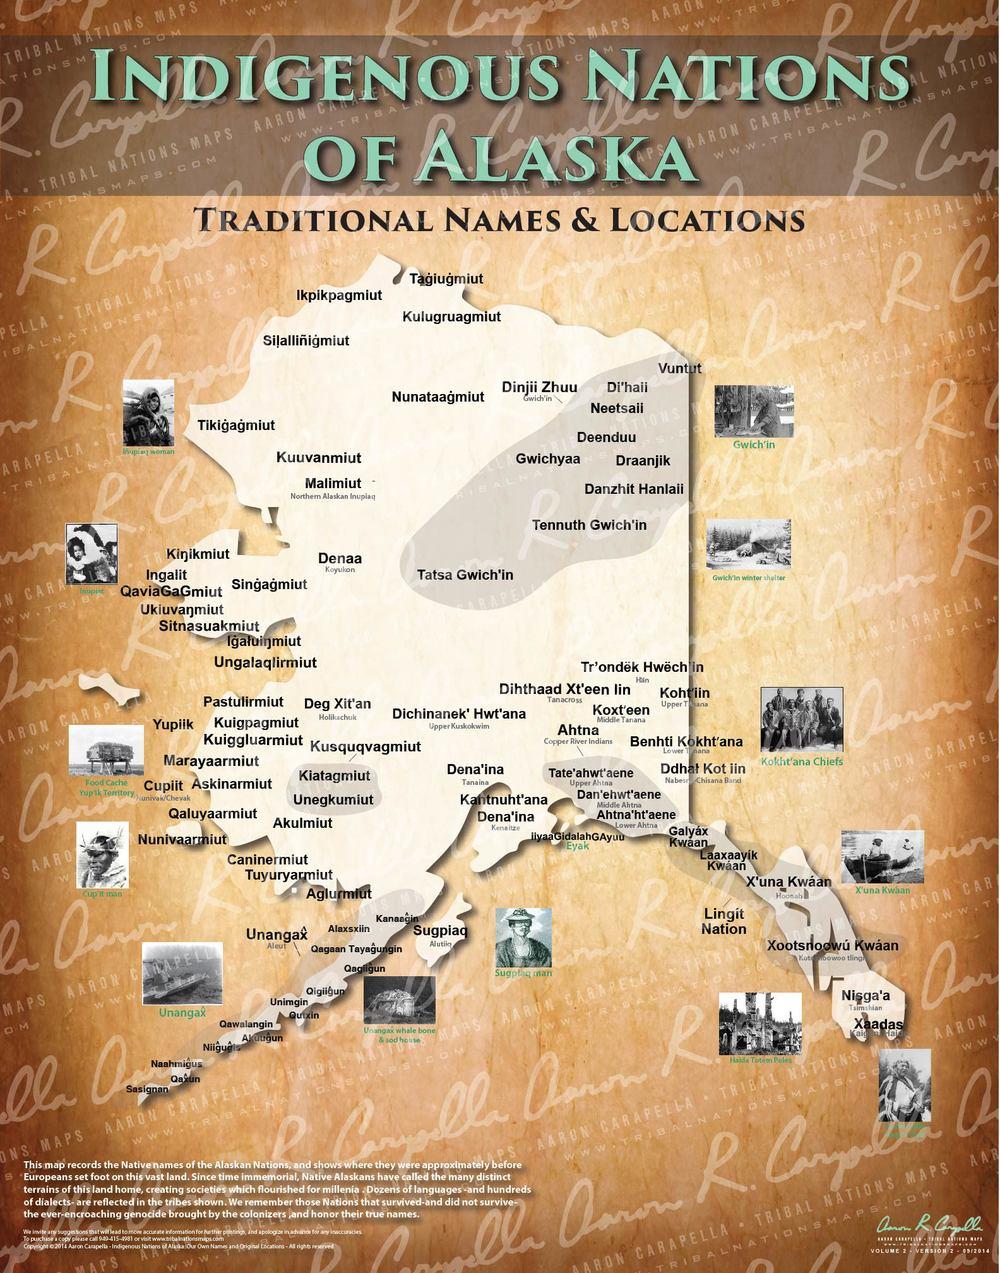 Alaska - Vaol 2 - Ver 2 - 22x28-01 (1).jpg